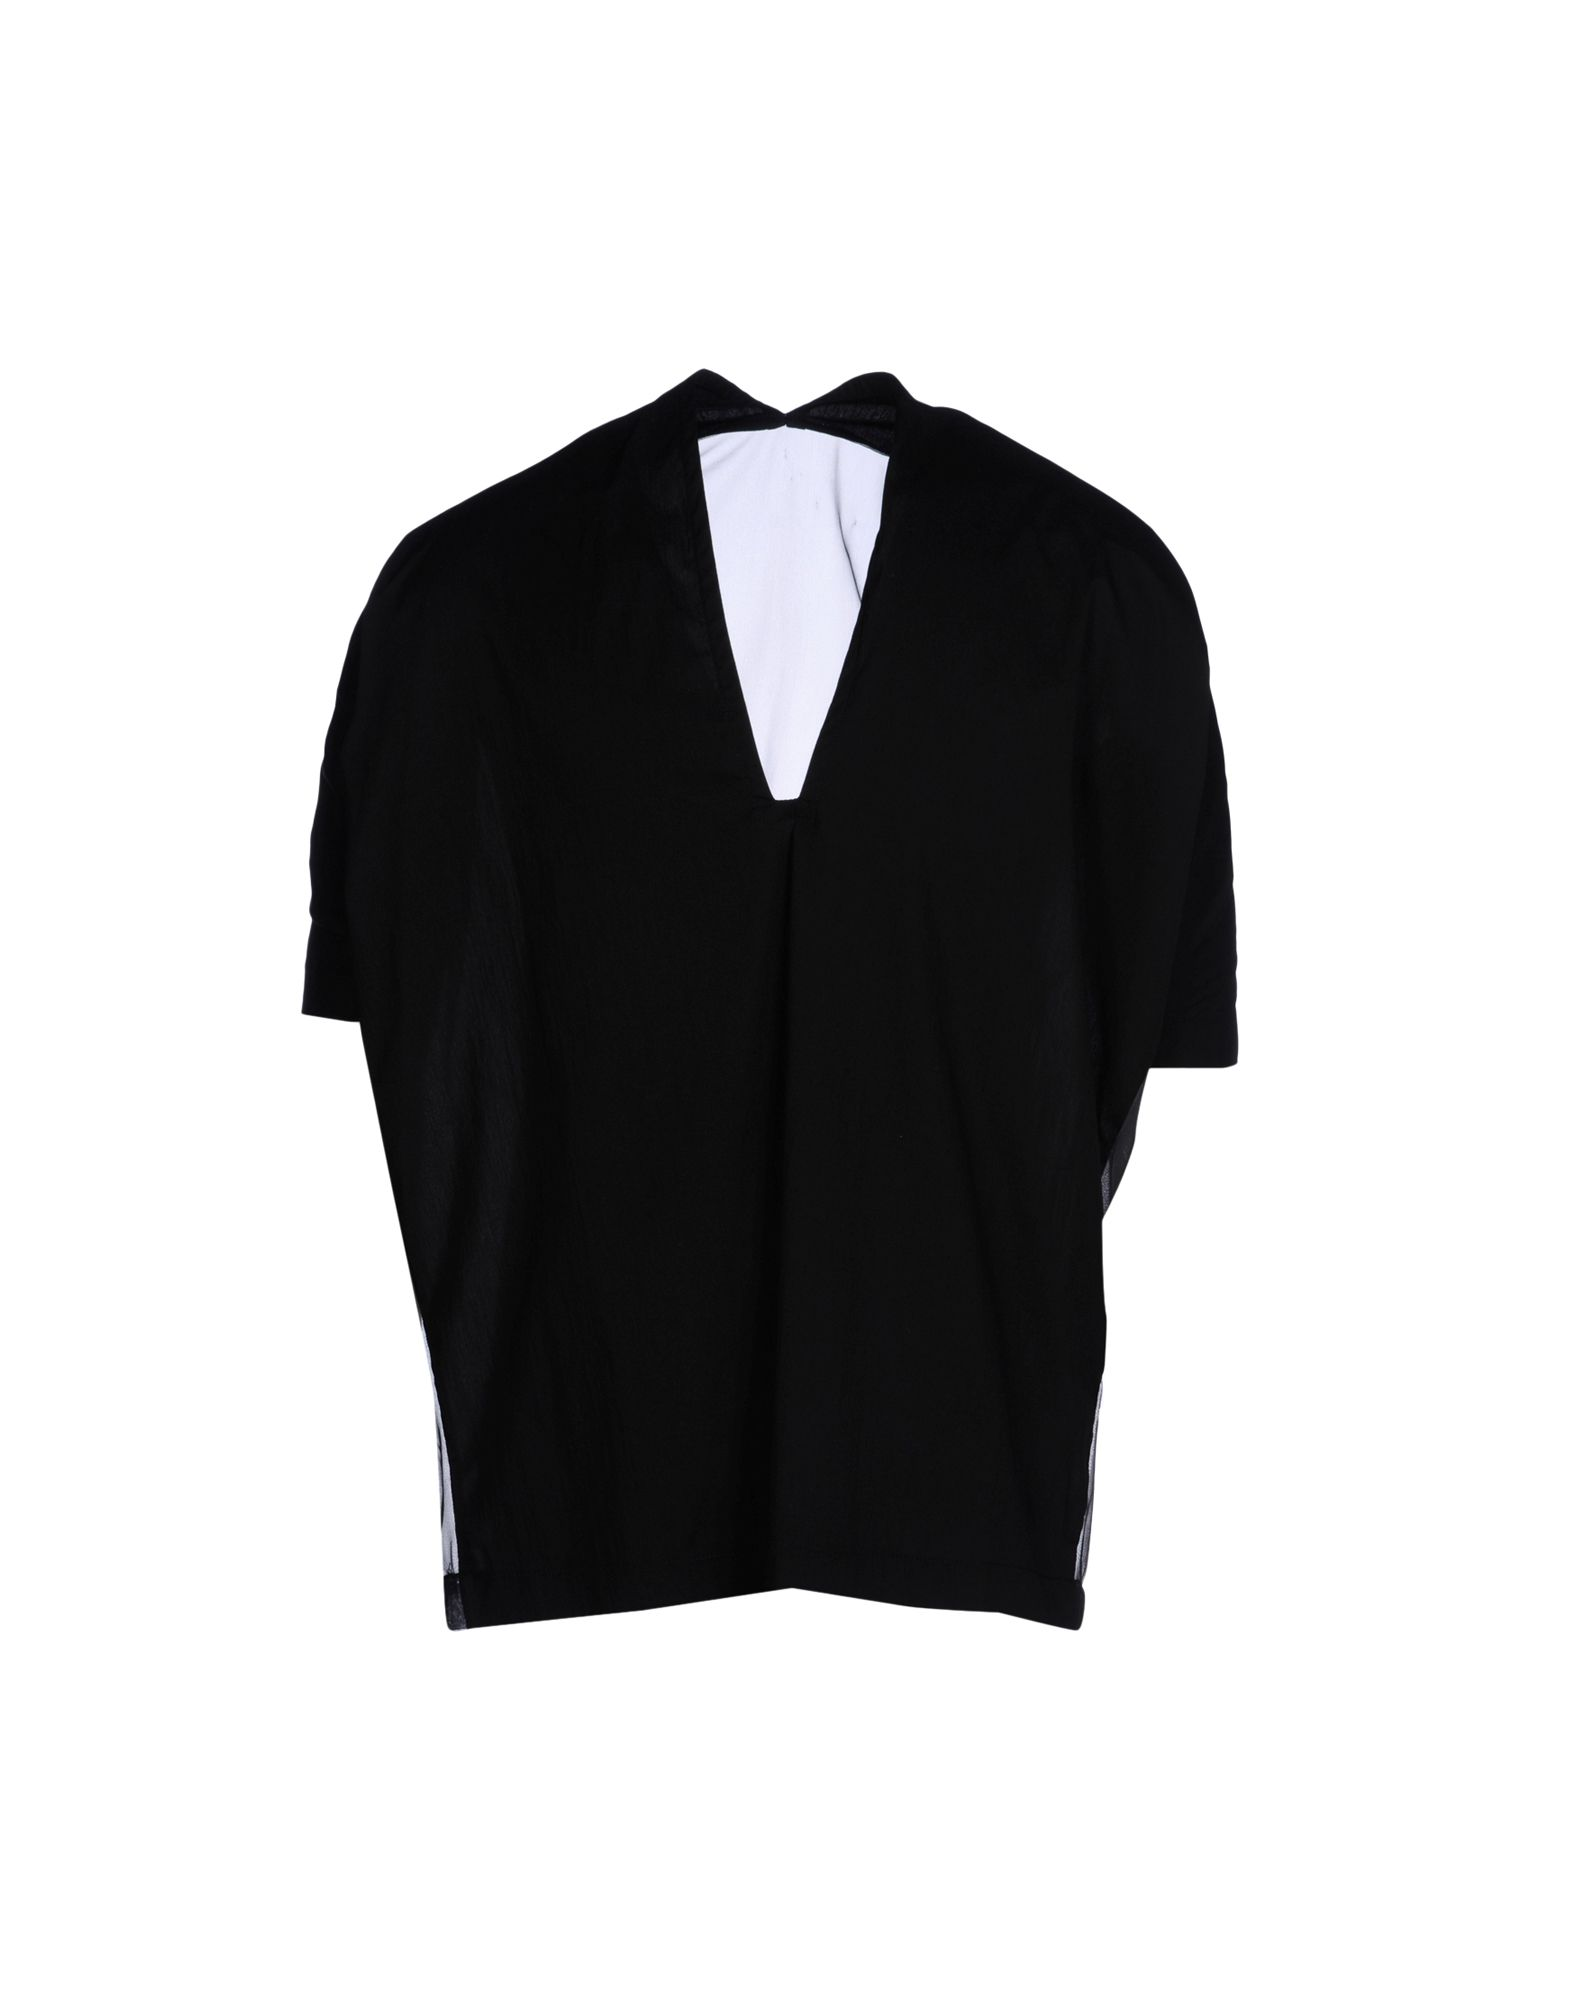 Купить Блузку Онлайн